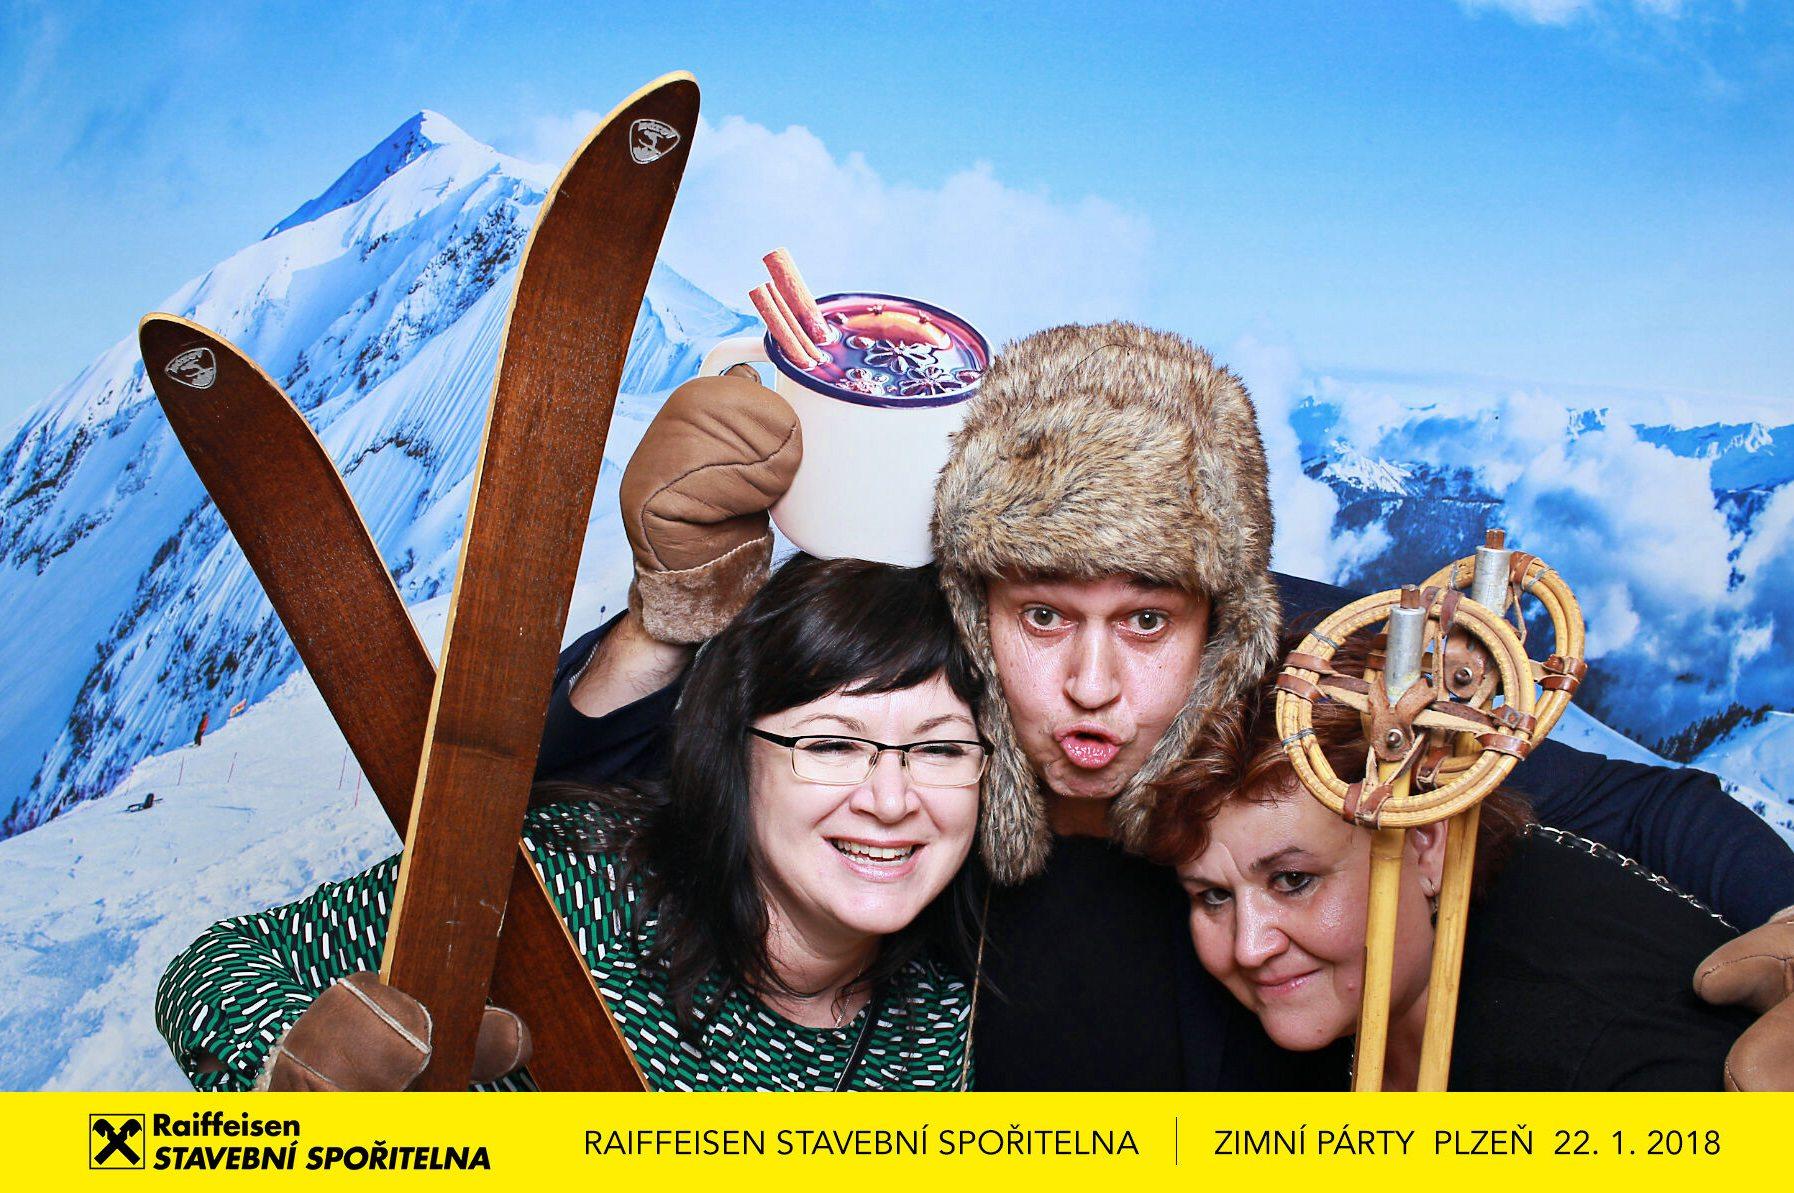 fotokoutek-raiffesien-stavebni-sporitelna-zimni-party-plzen-22-1-2018-383065